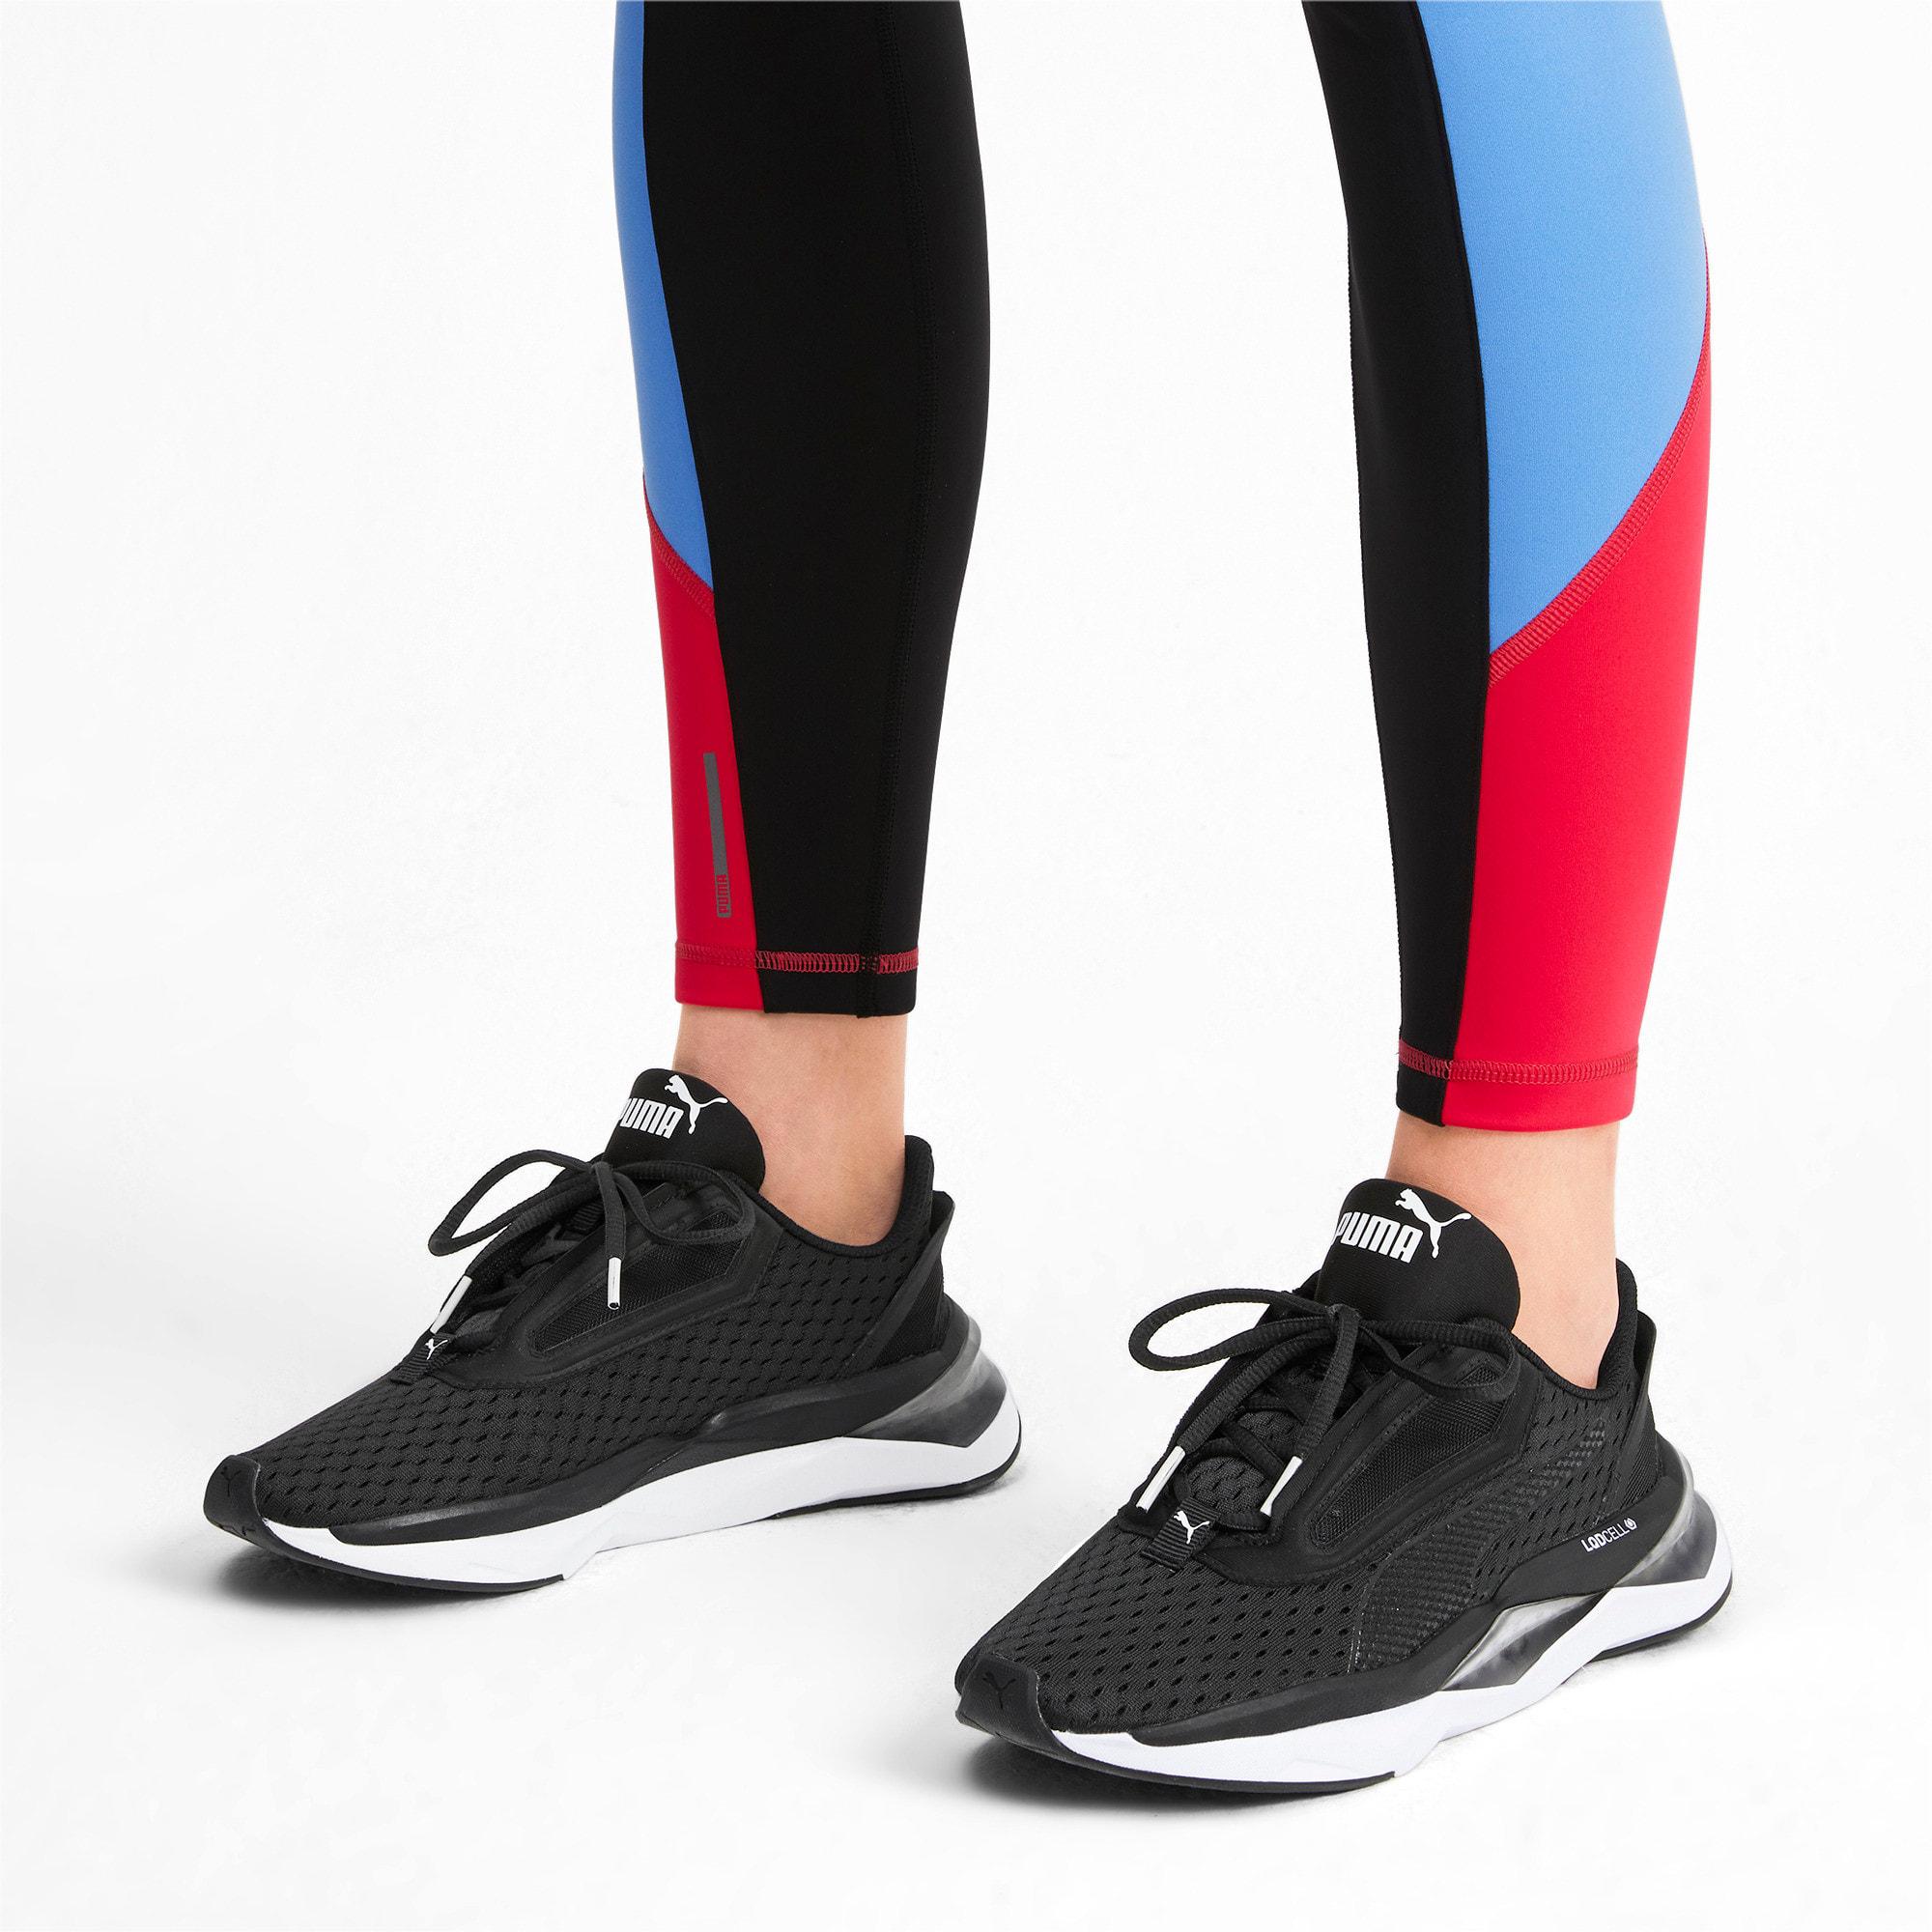 Miniatura 2 de Zapatos deentrenamiento LQDCELL Shatter XT para mujer, Puma Black-Puma White, mediano